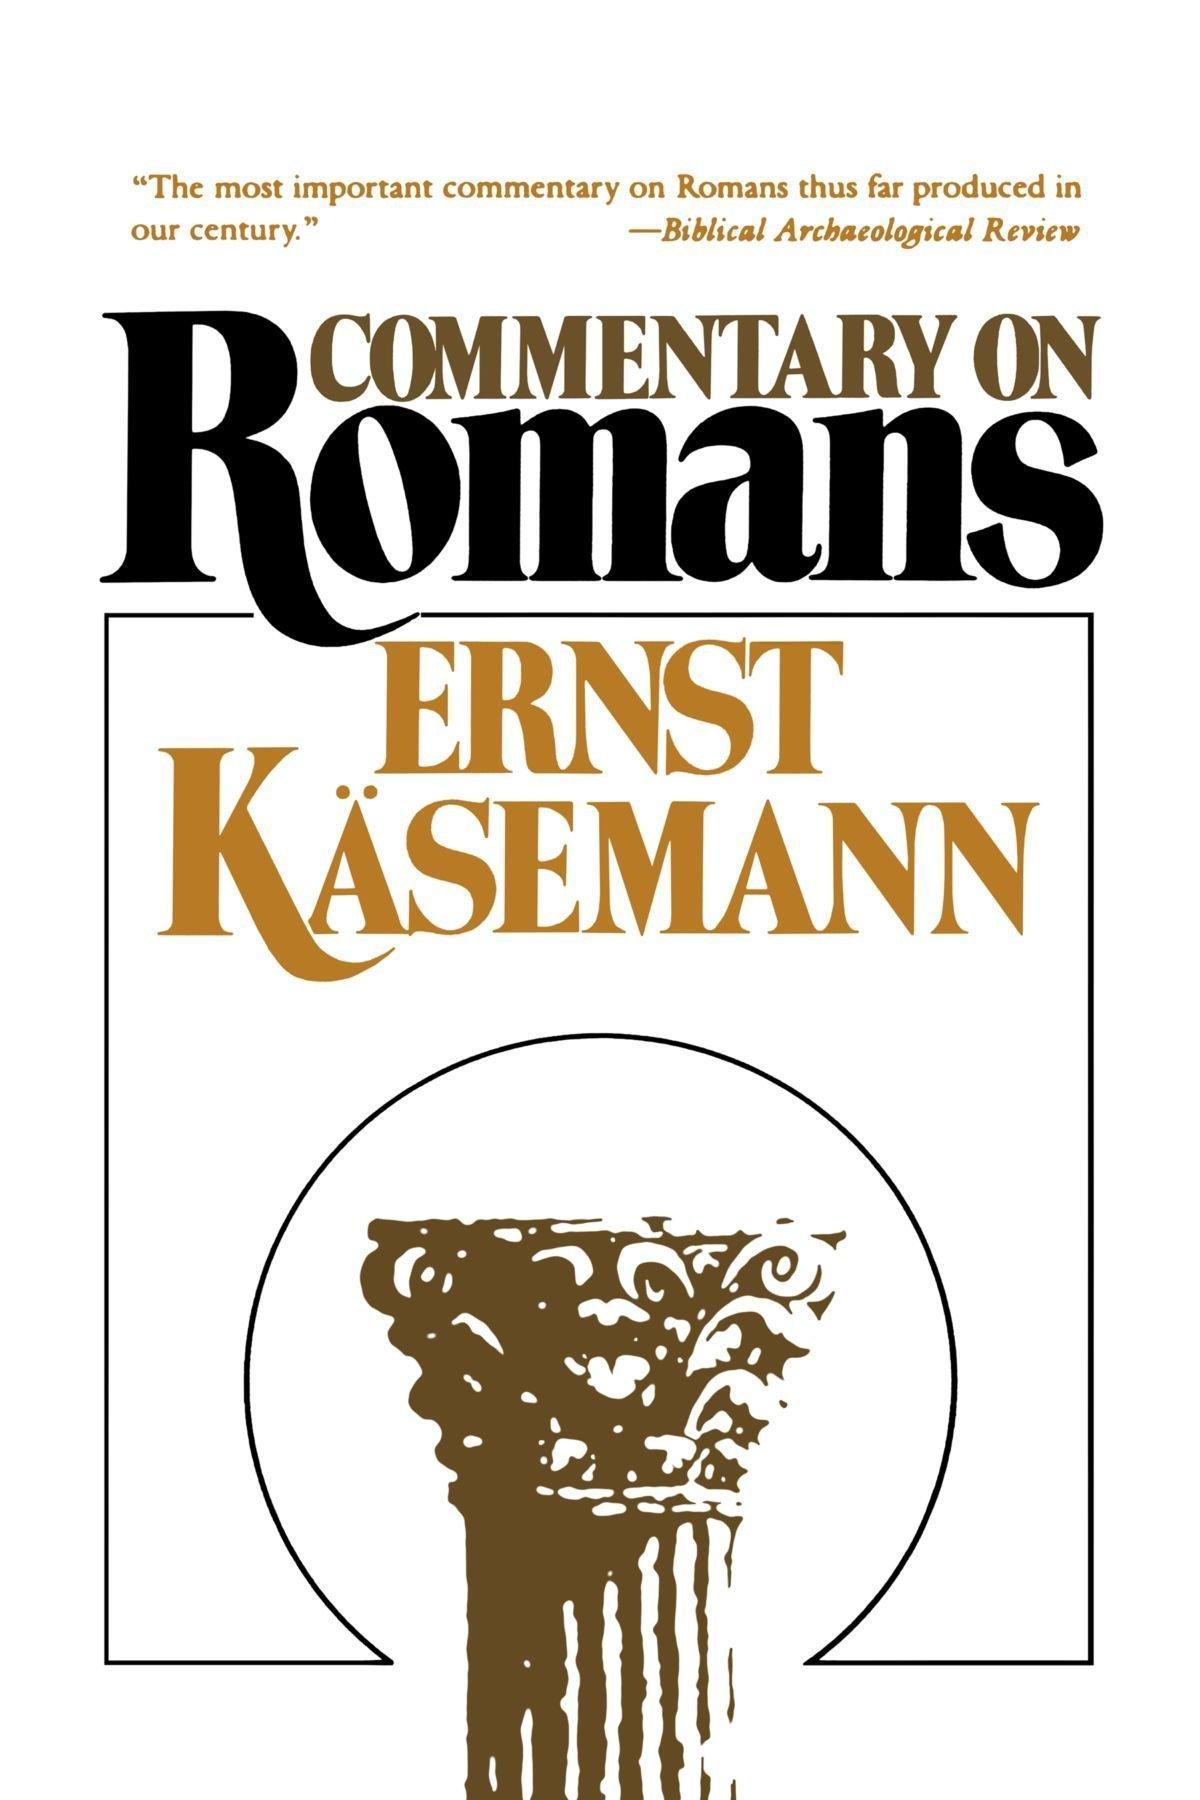 Commentary on romans ernst ksemann geoffrey w bromiley commentary on romans ernst ksemann geoffrey w bromiley 9780802808608 amazon books sciox Gallery